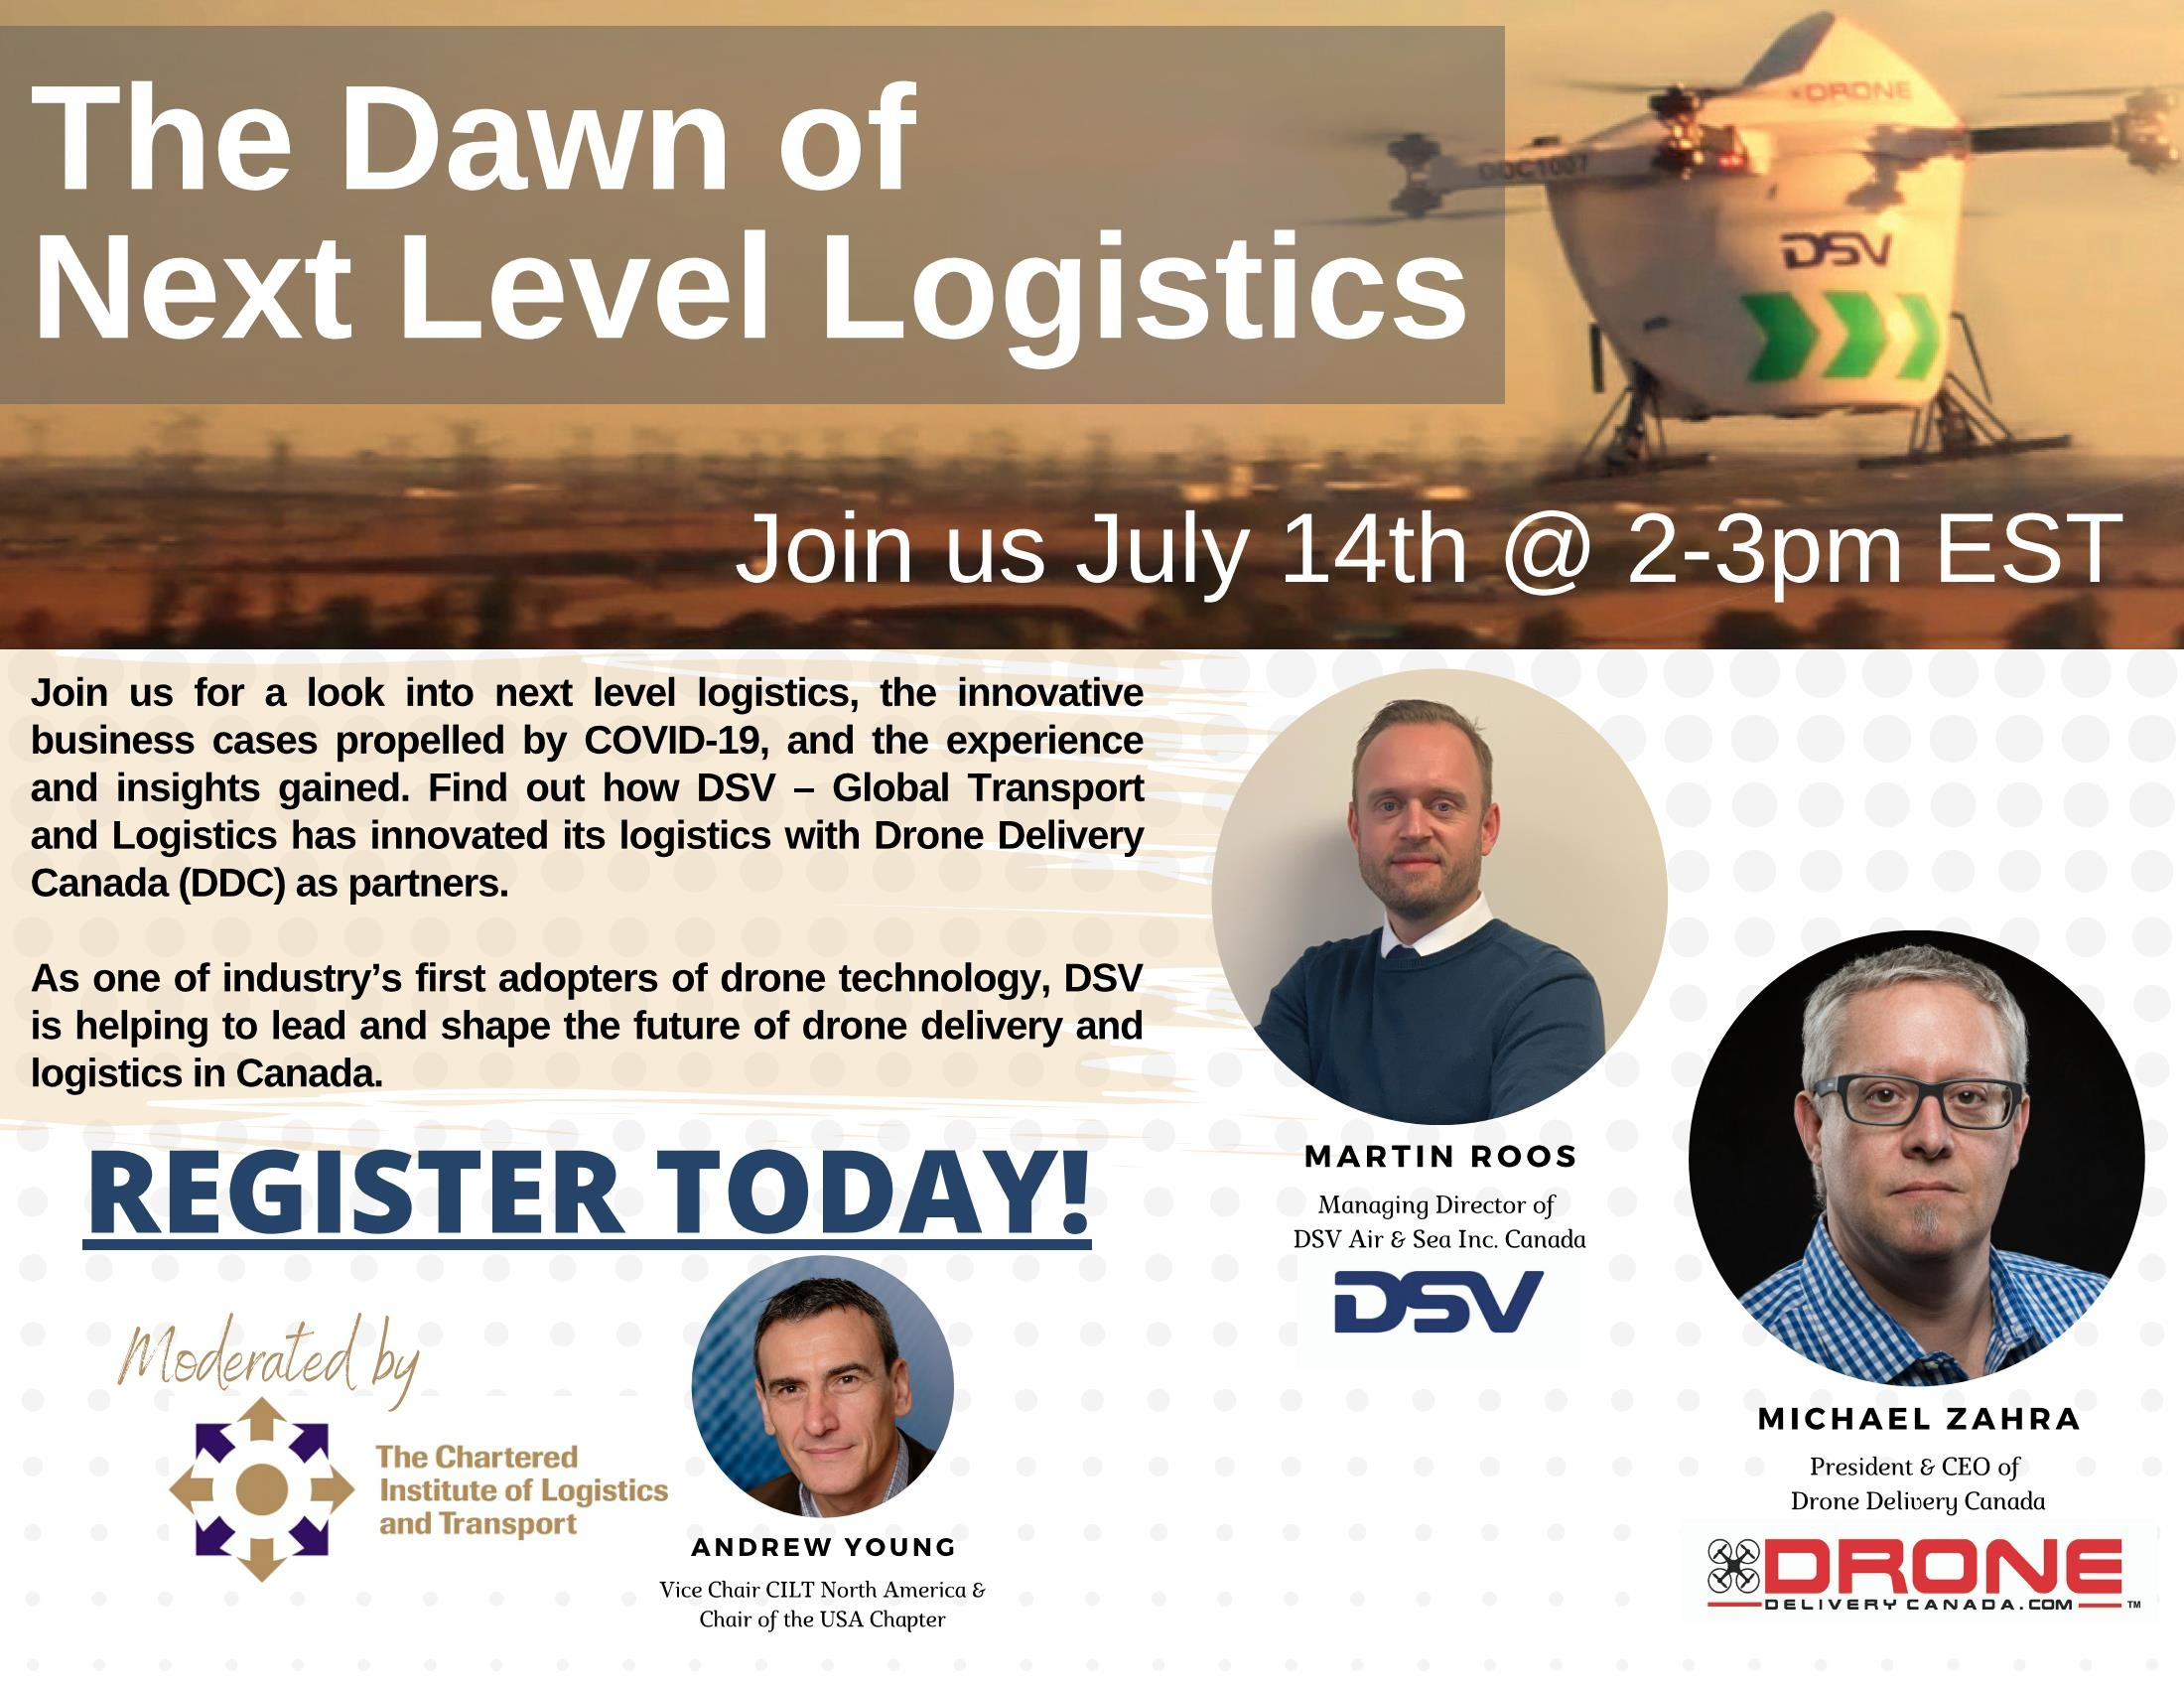 The Dawn of Next Level Logistics Webinar